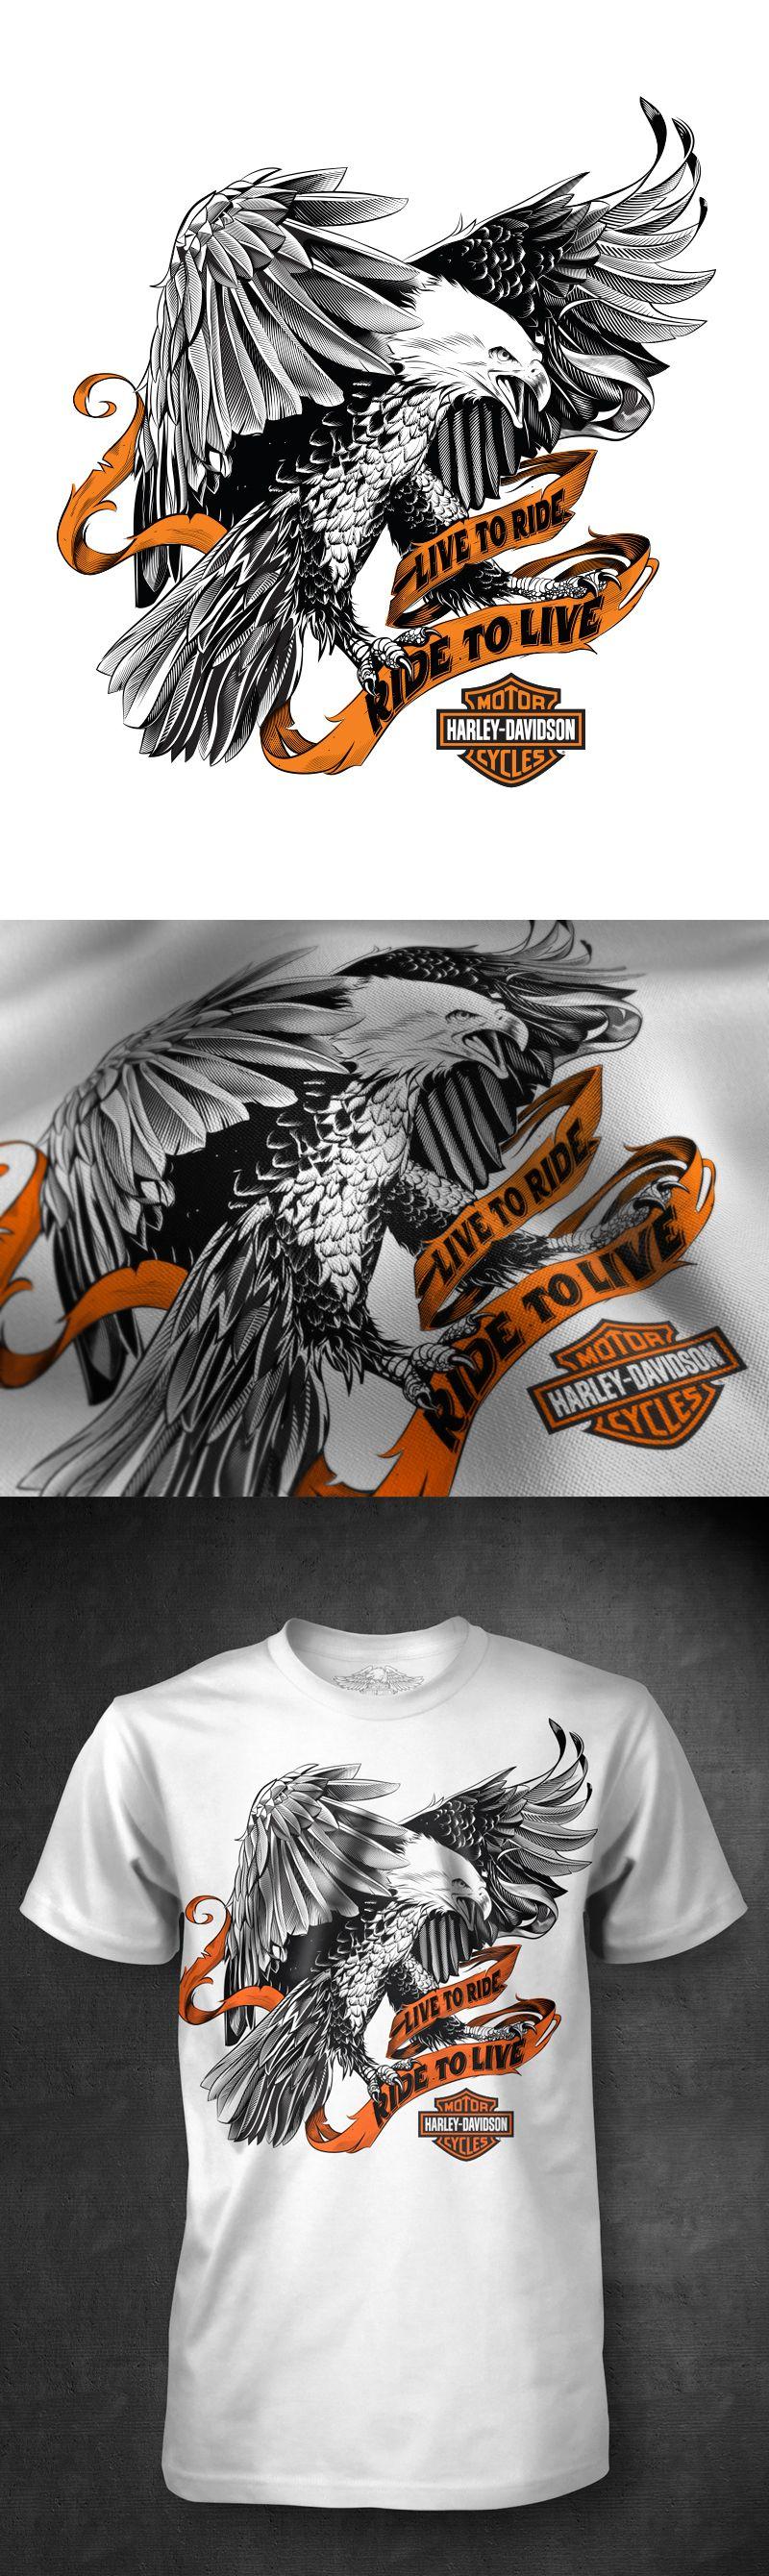 abraham spreuken motor T shirts designs for Harley Davidson by Abraham García   Birth  abraham spreuken motor